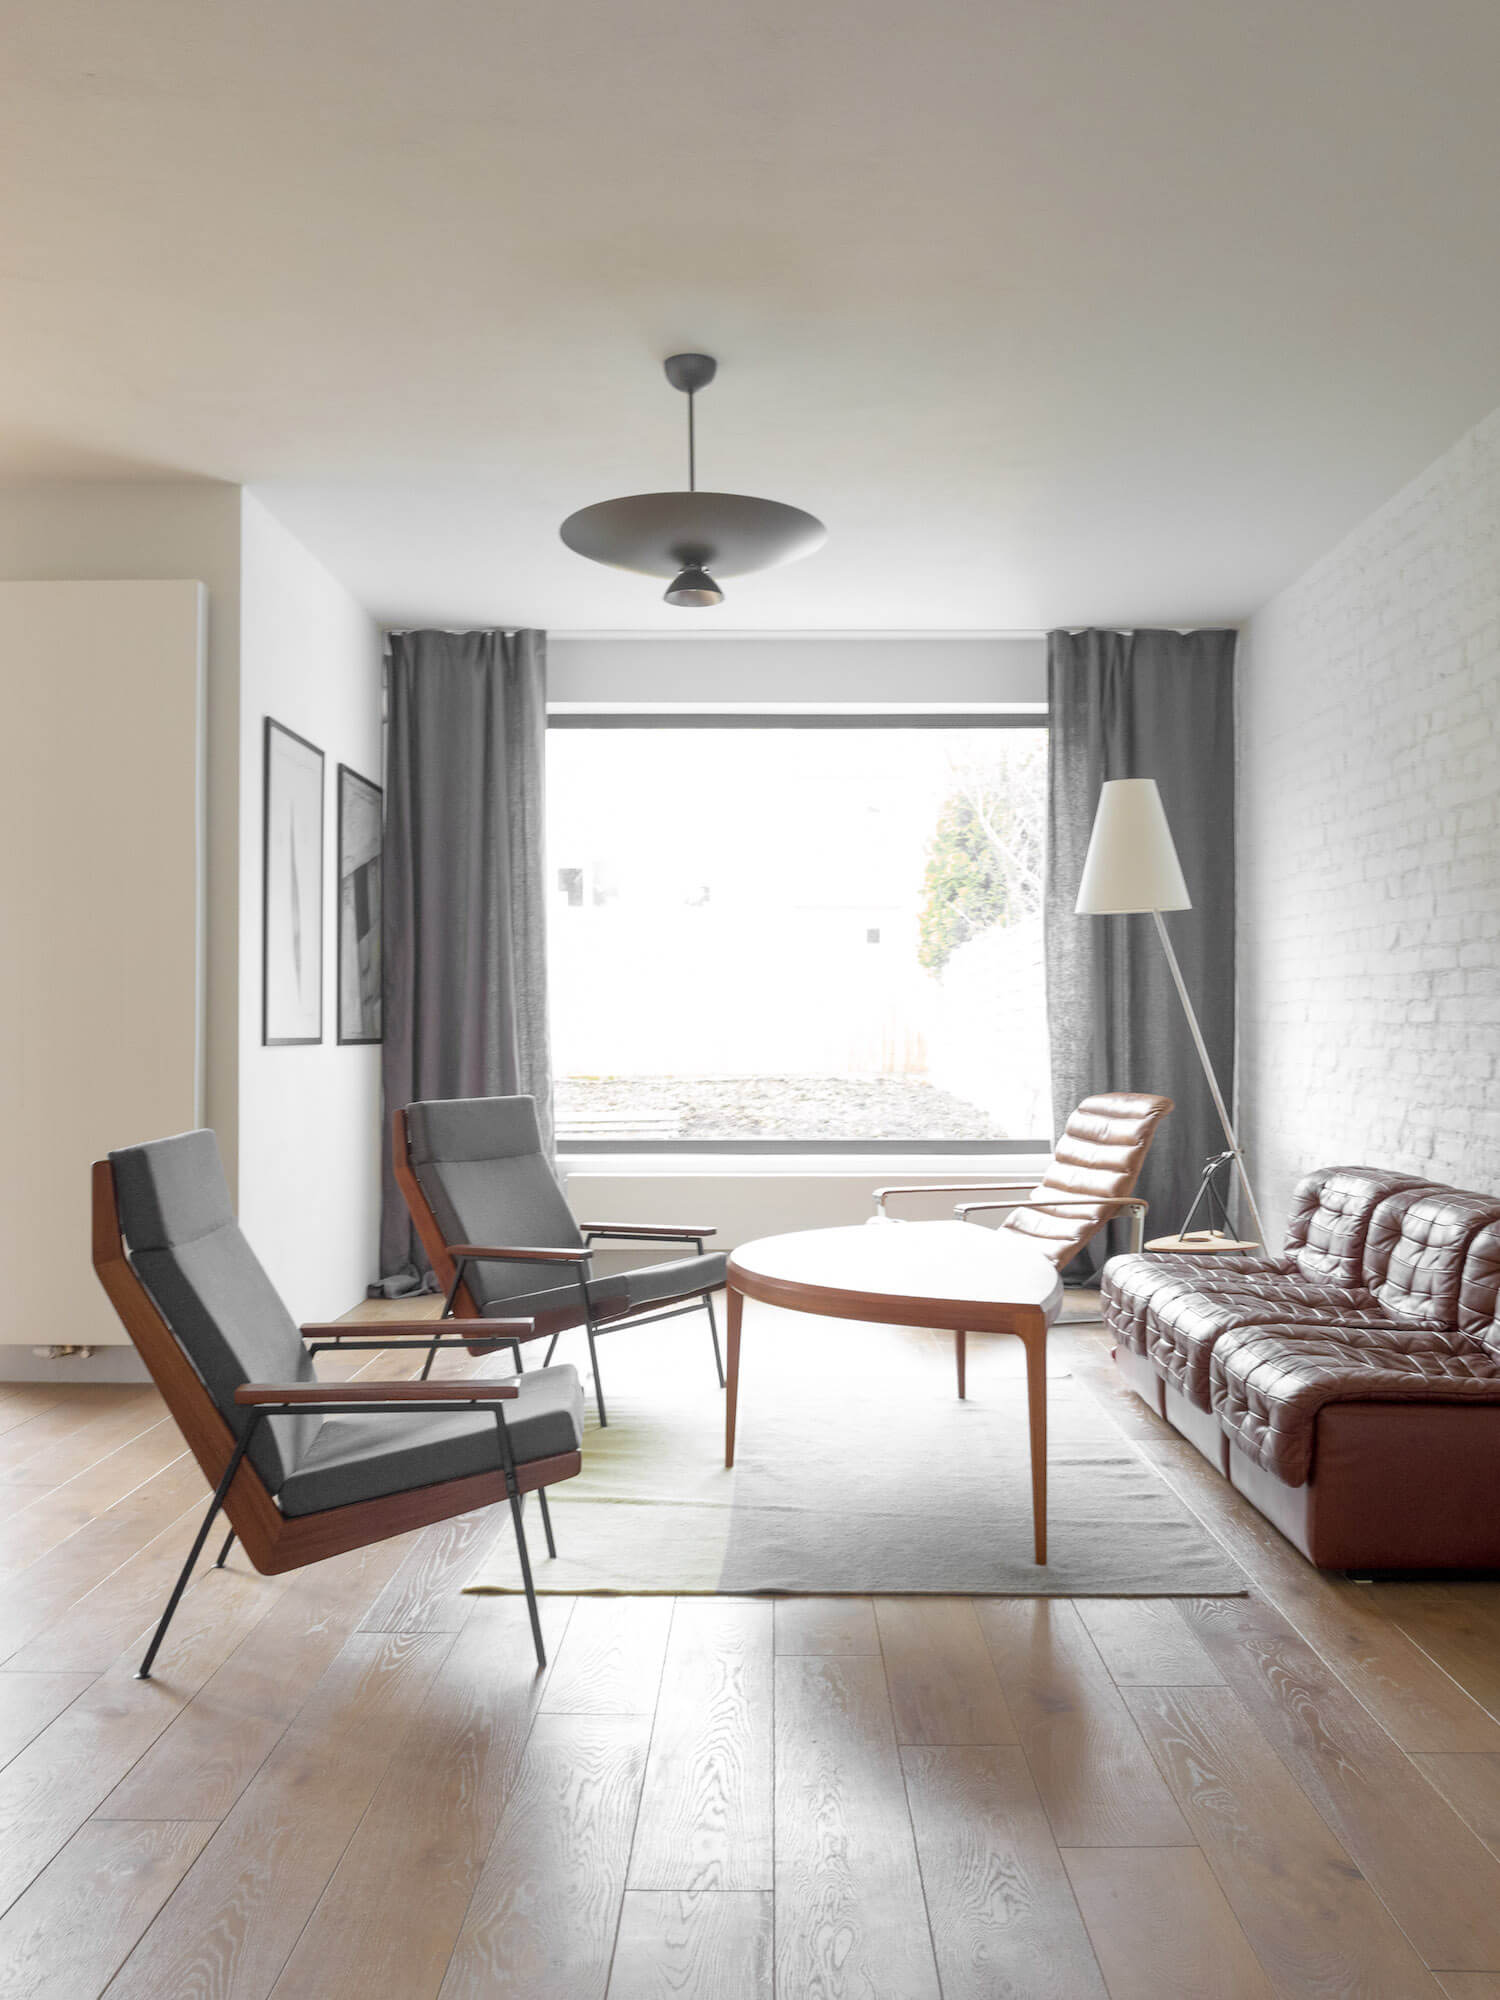 est living house by the park loft kolasinski 7